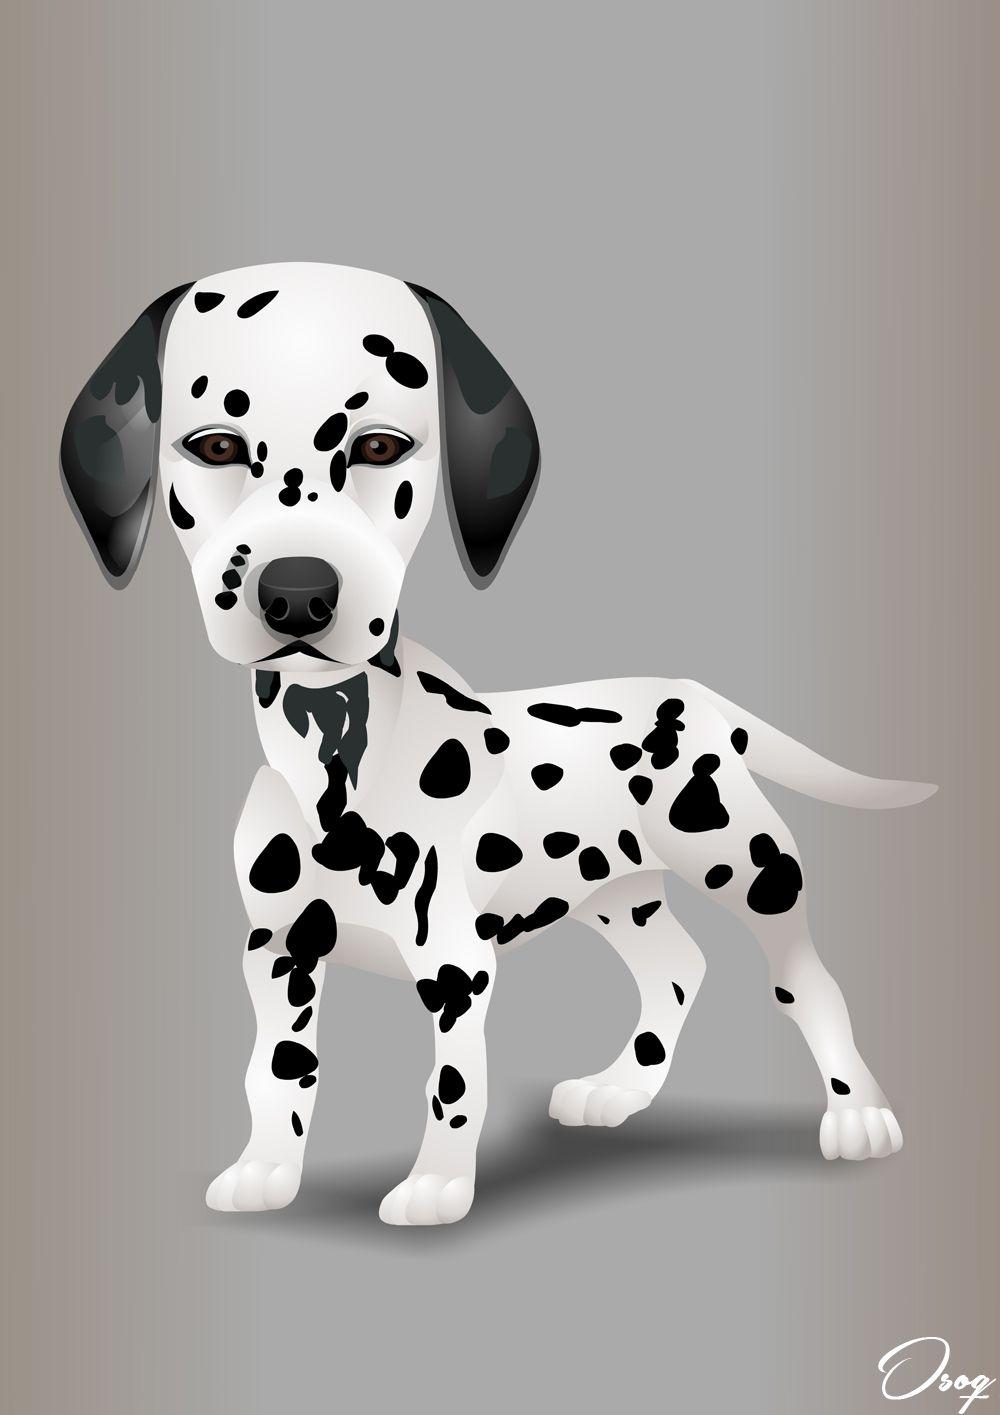 a58e5460ae88 Dalmatian Cartoon Caricature Dalmatian, Caricature, How To Draw Hands,  Snoopy, Dalmatians,